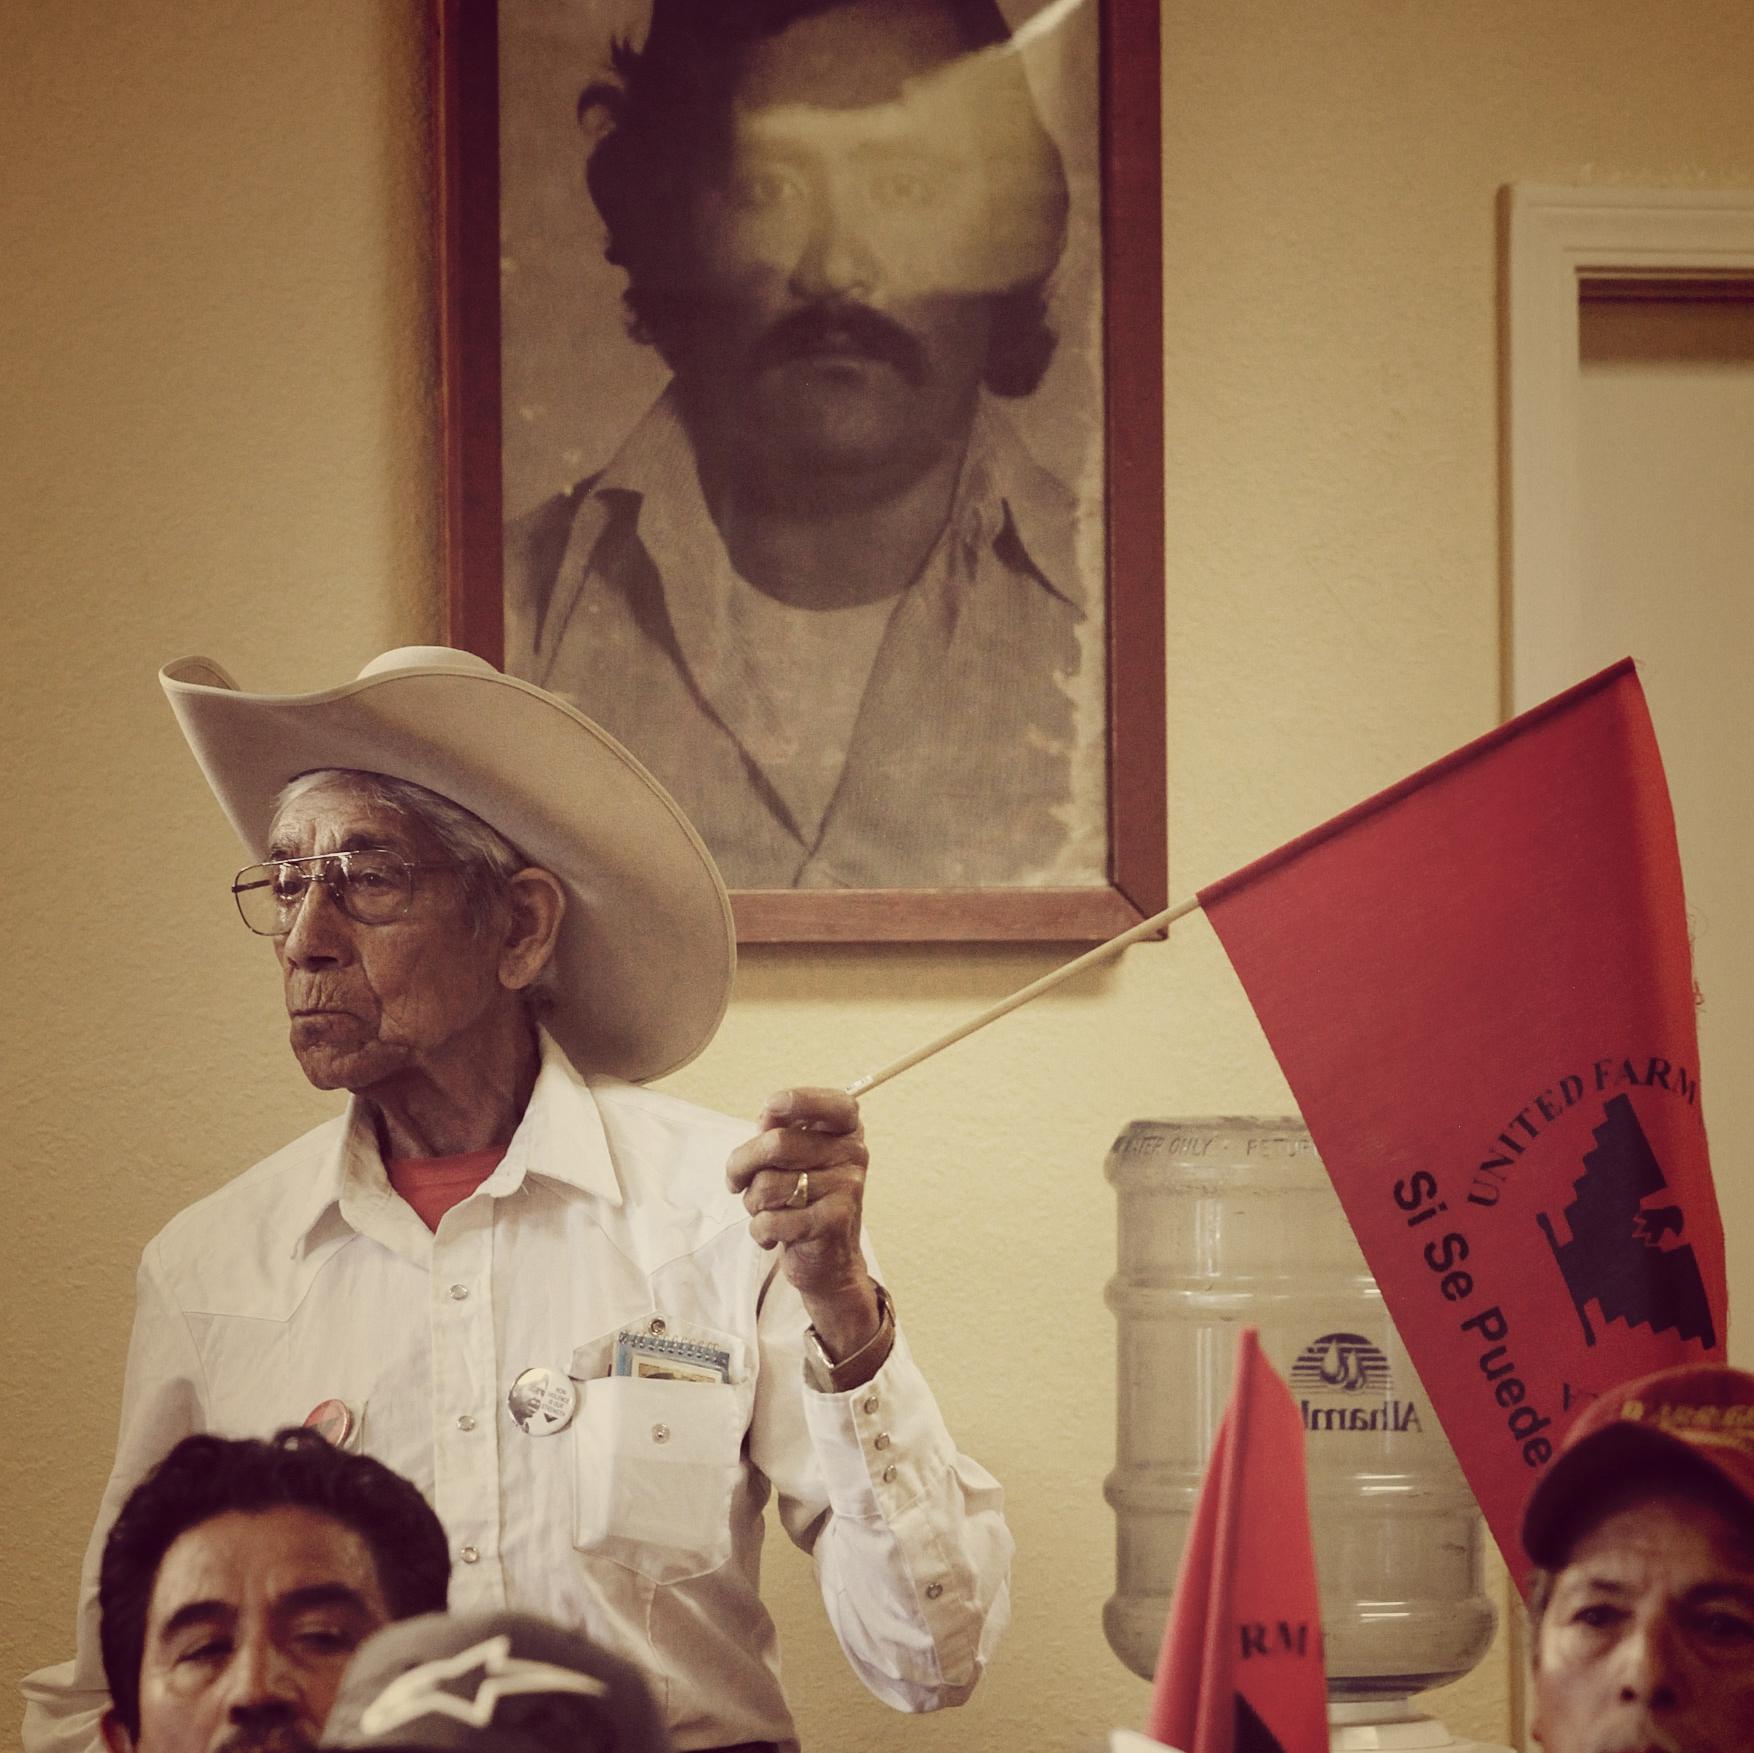 Latest News About Immigration Reform 2013: Est100 一些攝影(some Photos): Landmark, Immigration Bill